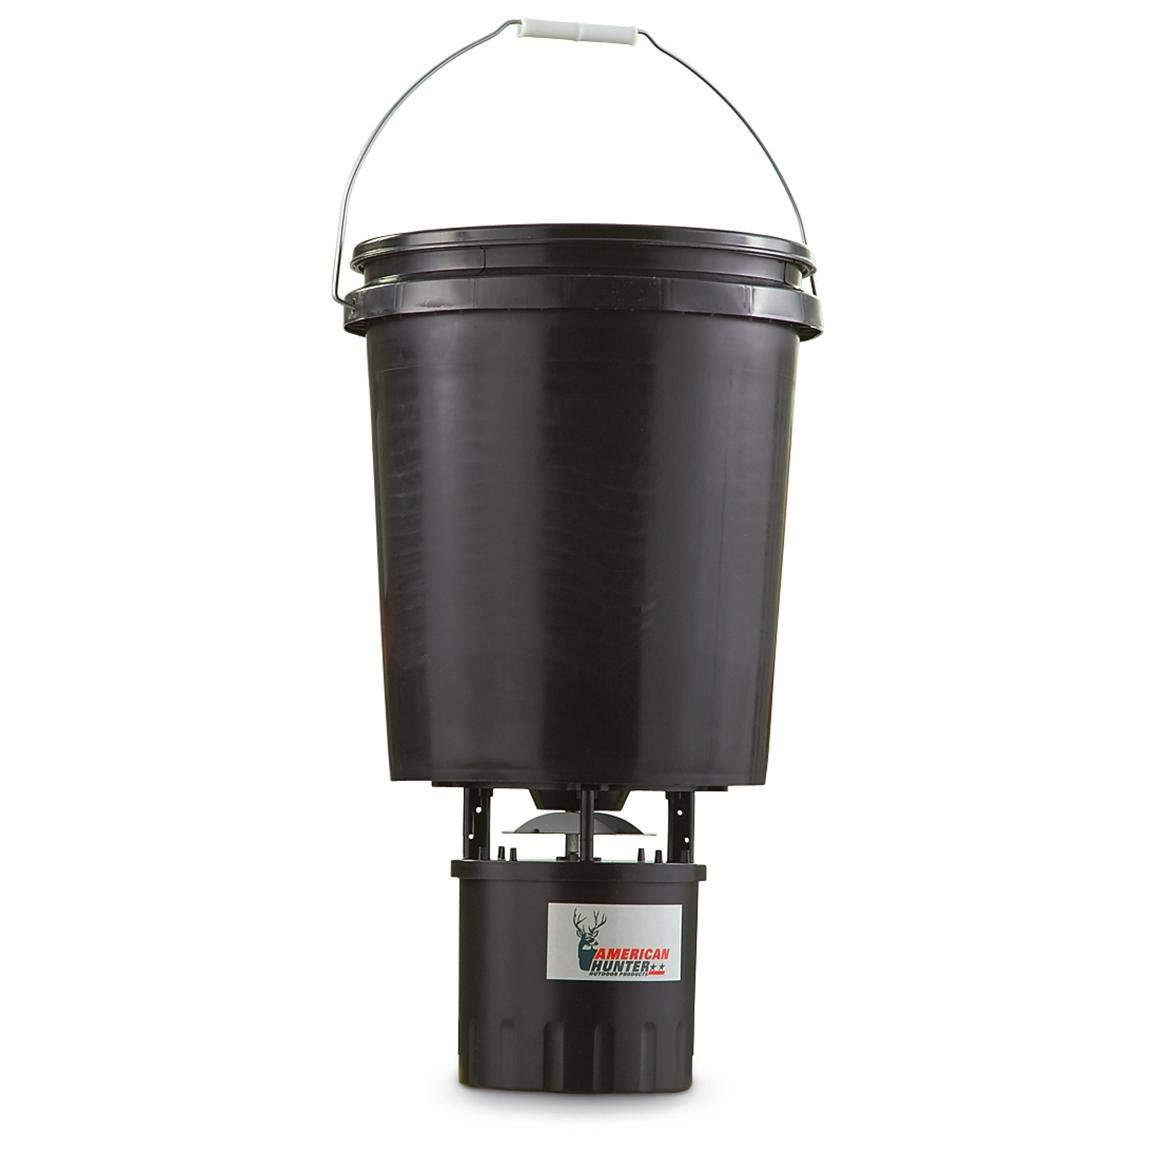 AMERICAN HUNTER 5-Gallon Digital Hanging Bucket Feeder by AMERICAN HUNTER